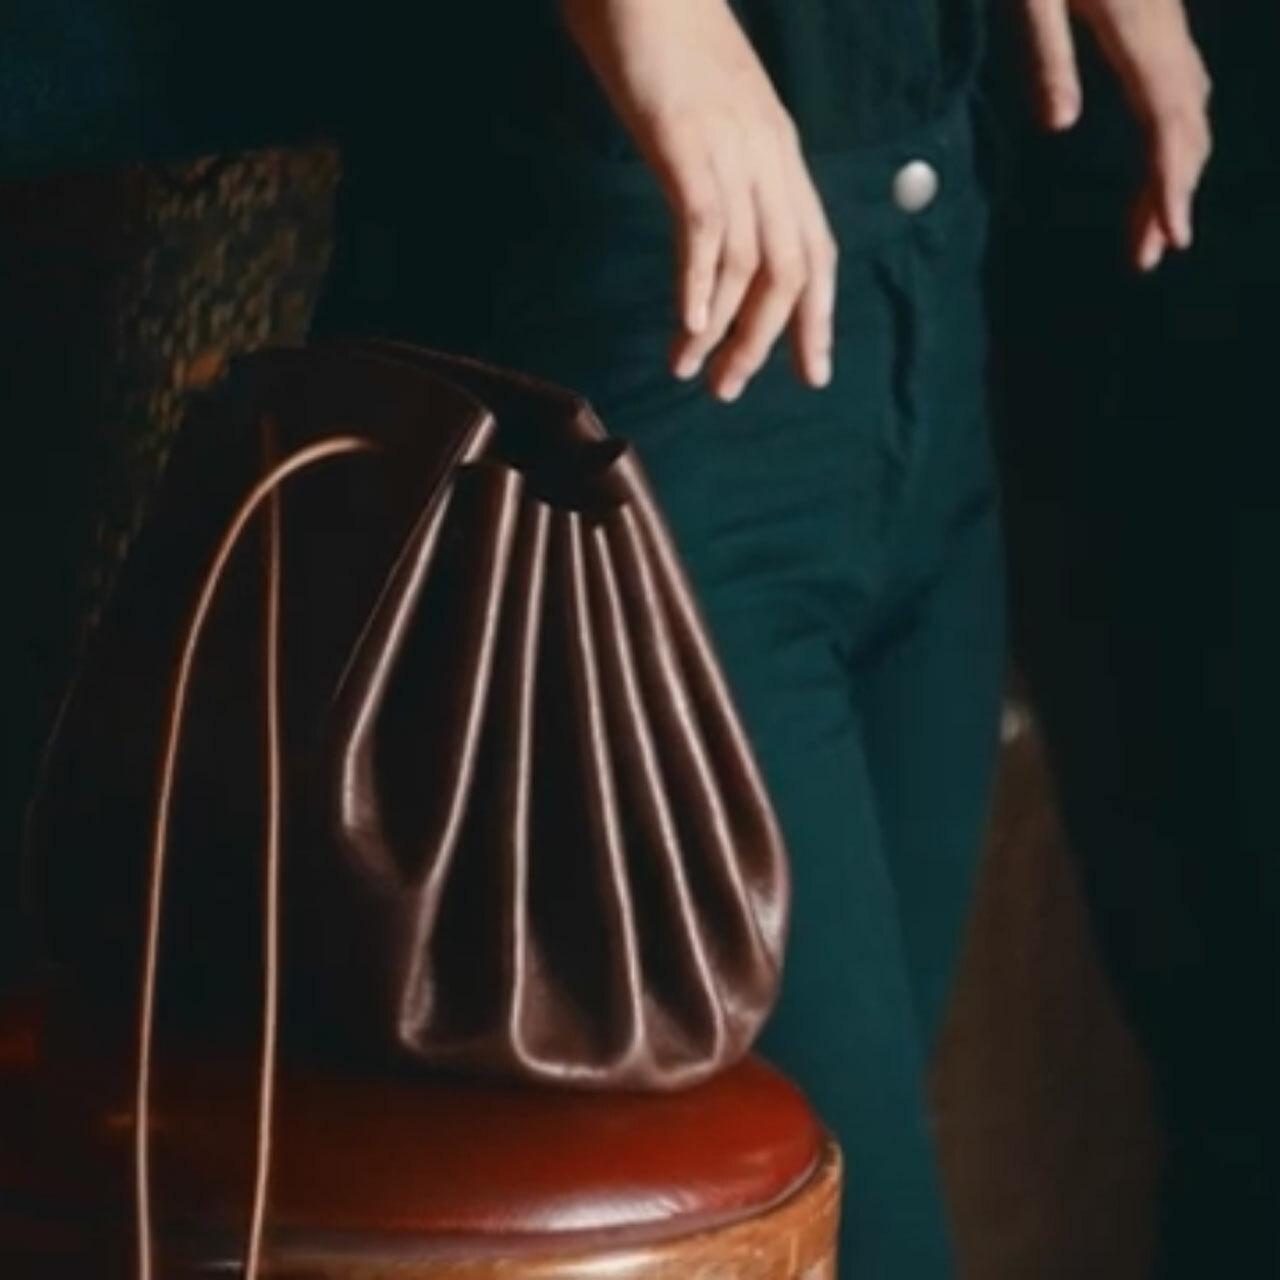 drawstring bag | ドローストリングバッグ